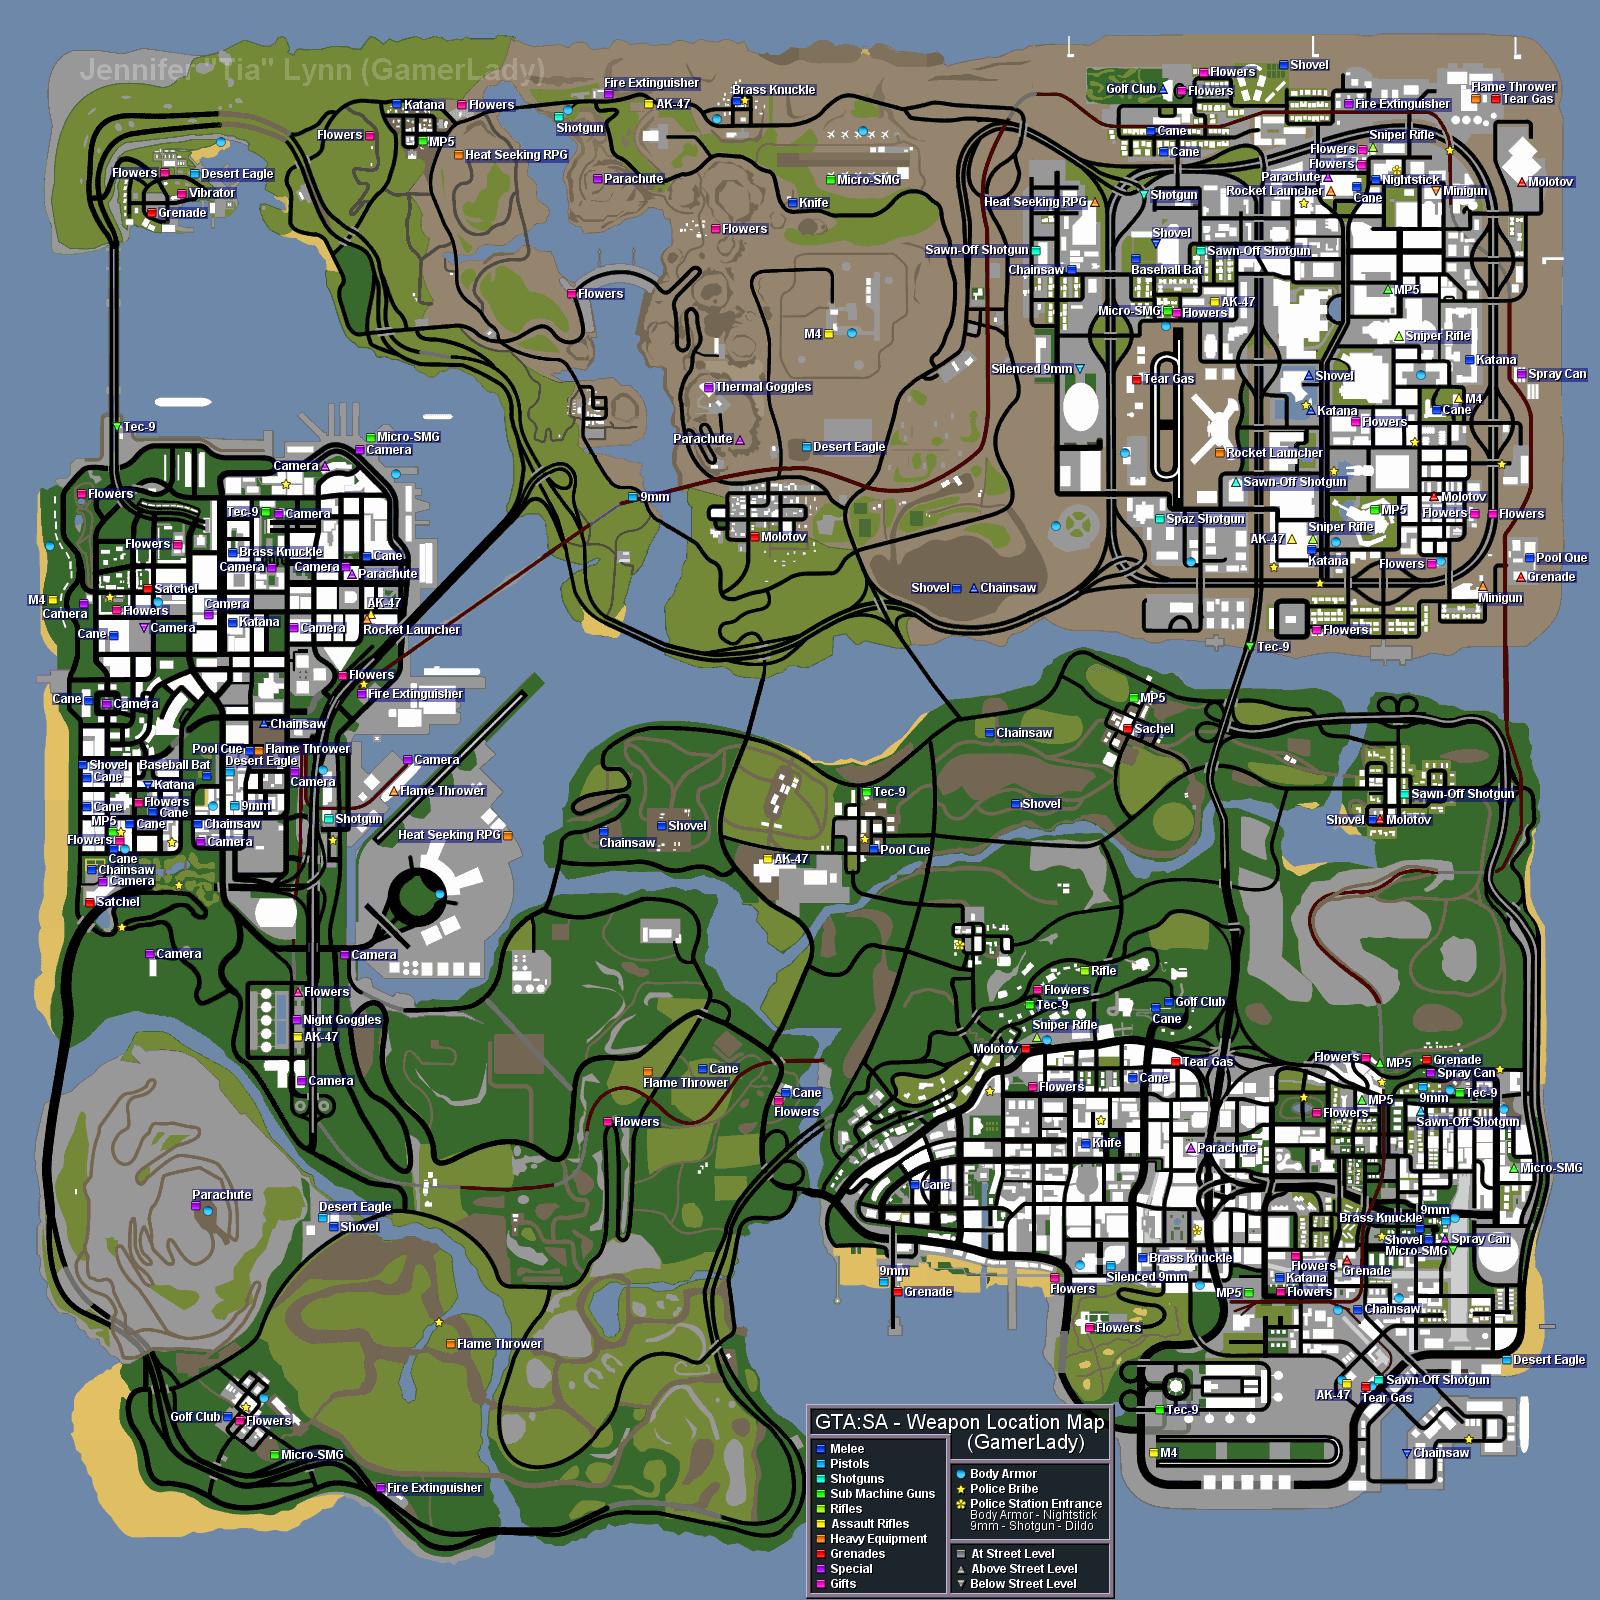 Карты GTA San Andreas: https://libertycity.ru/maps/161-karty-gta-sa.html